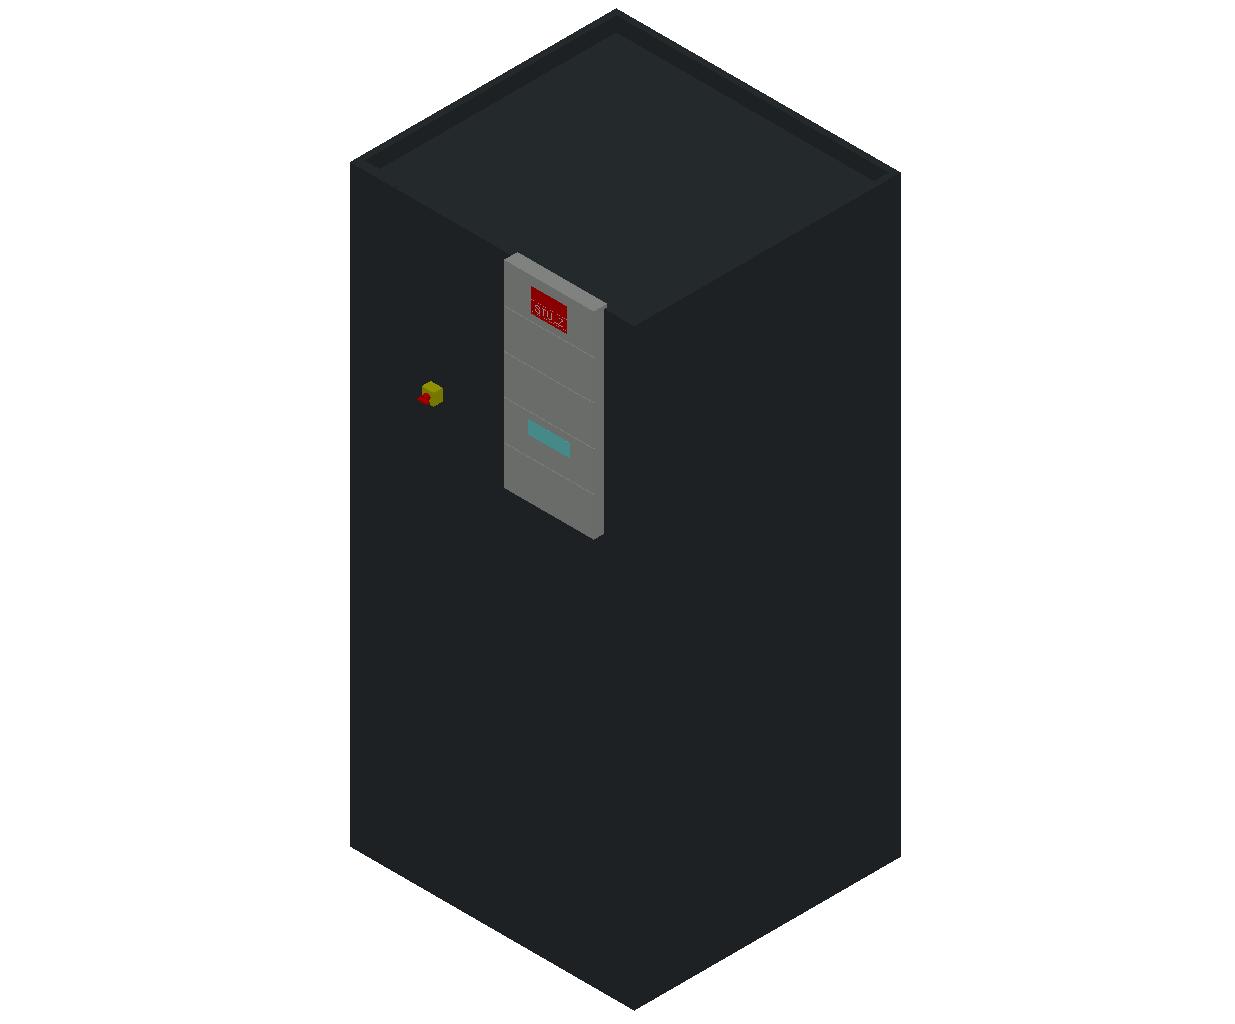 HC_Air Conditioner_Indoor Unit_MEPcontent_STULZ_CyberAir 3PRO_ASD-ALD_Single Circuit GE_ALD_481_GE_INT-EN.dwg